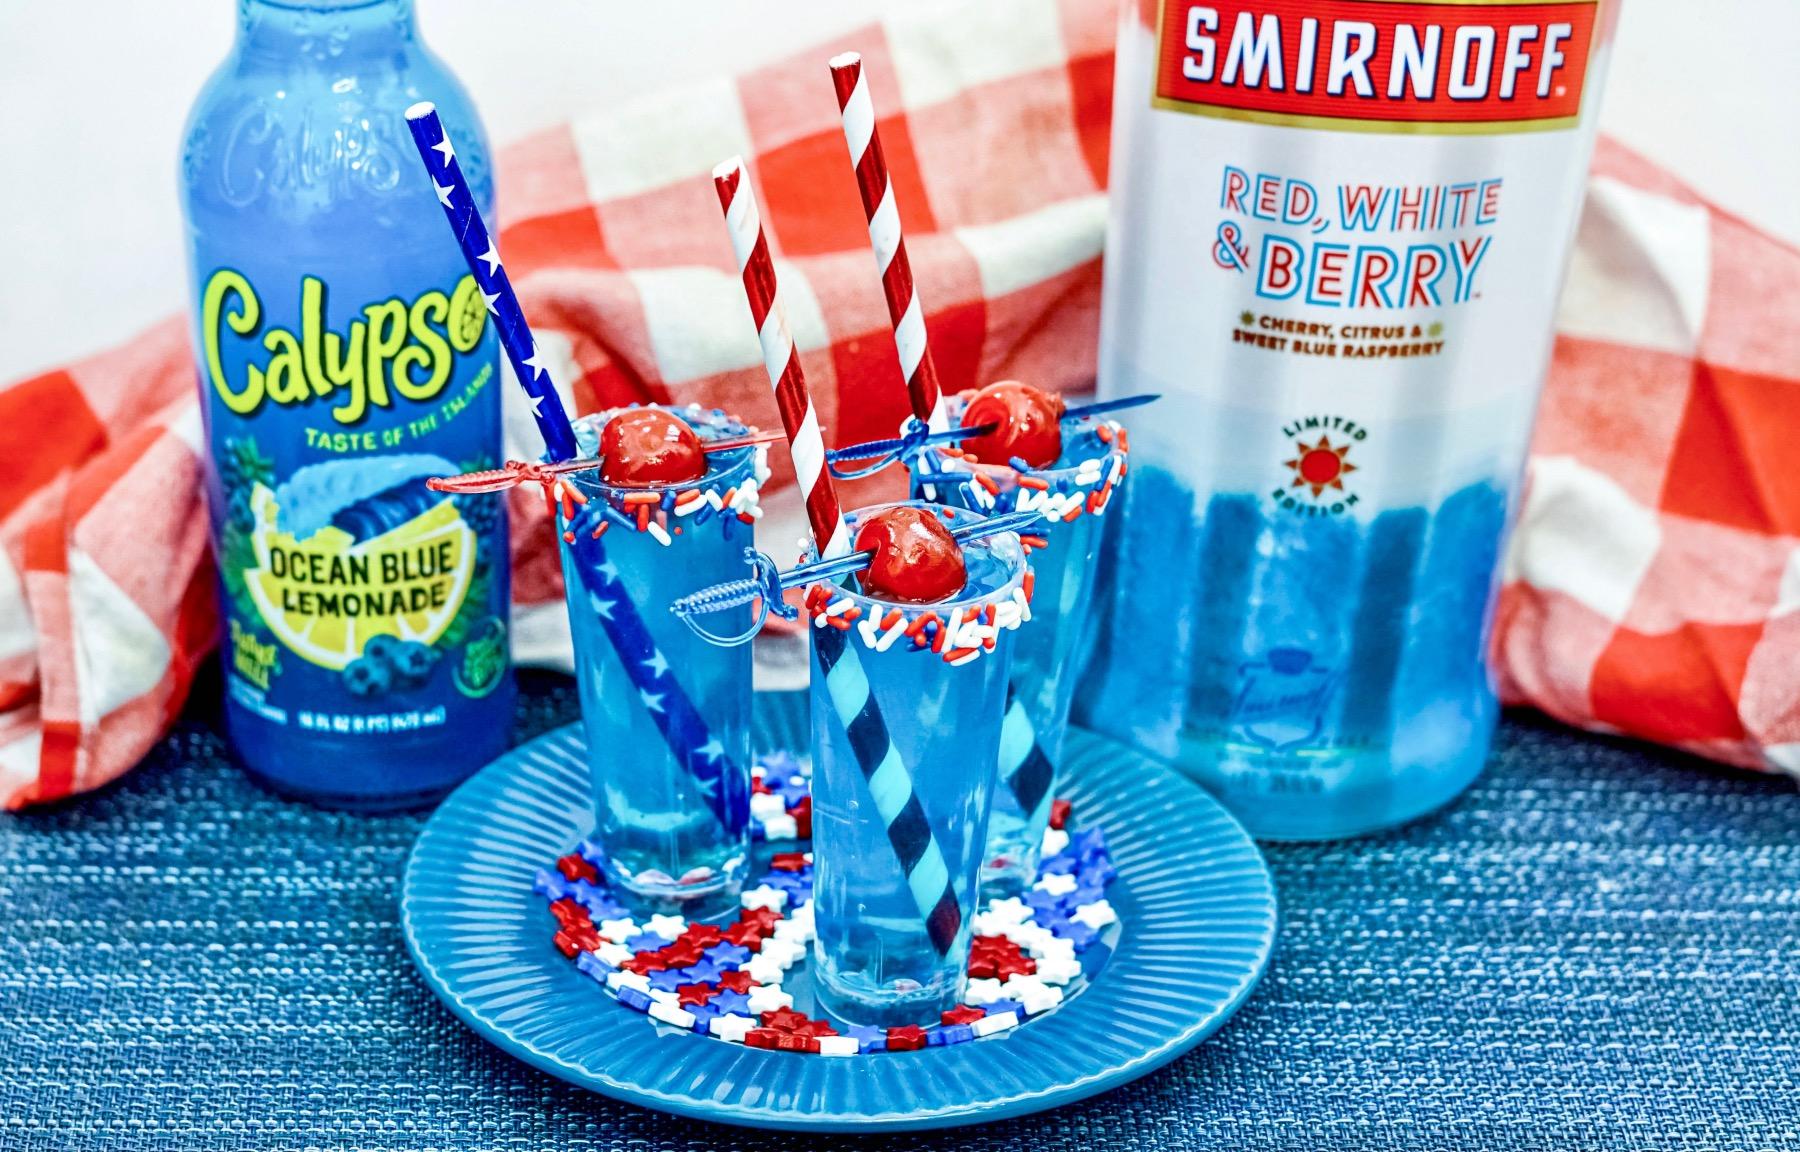 calypso ocean blue lemonade and smirnoff red, white and berry cocktail